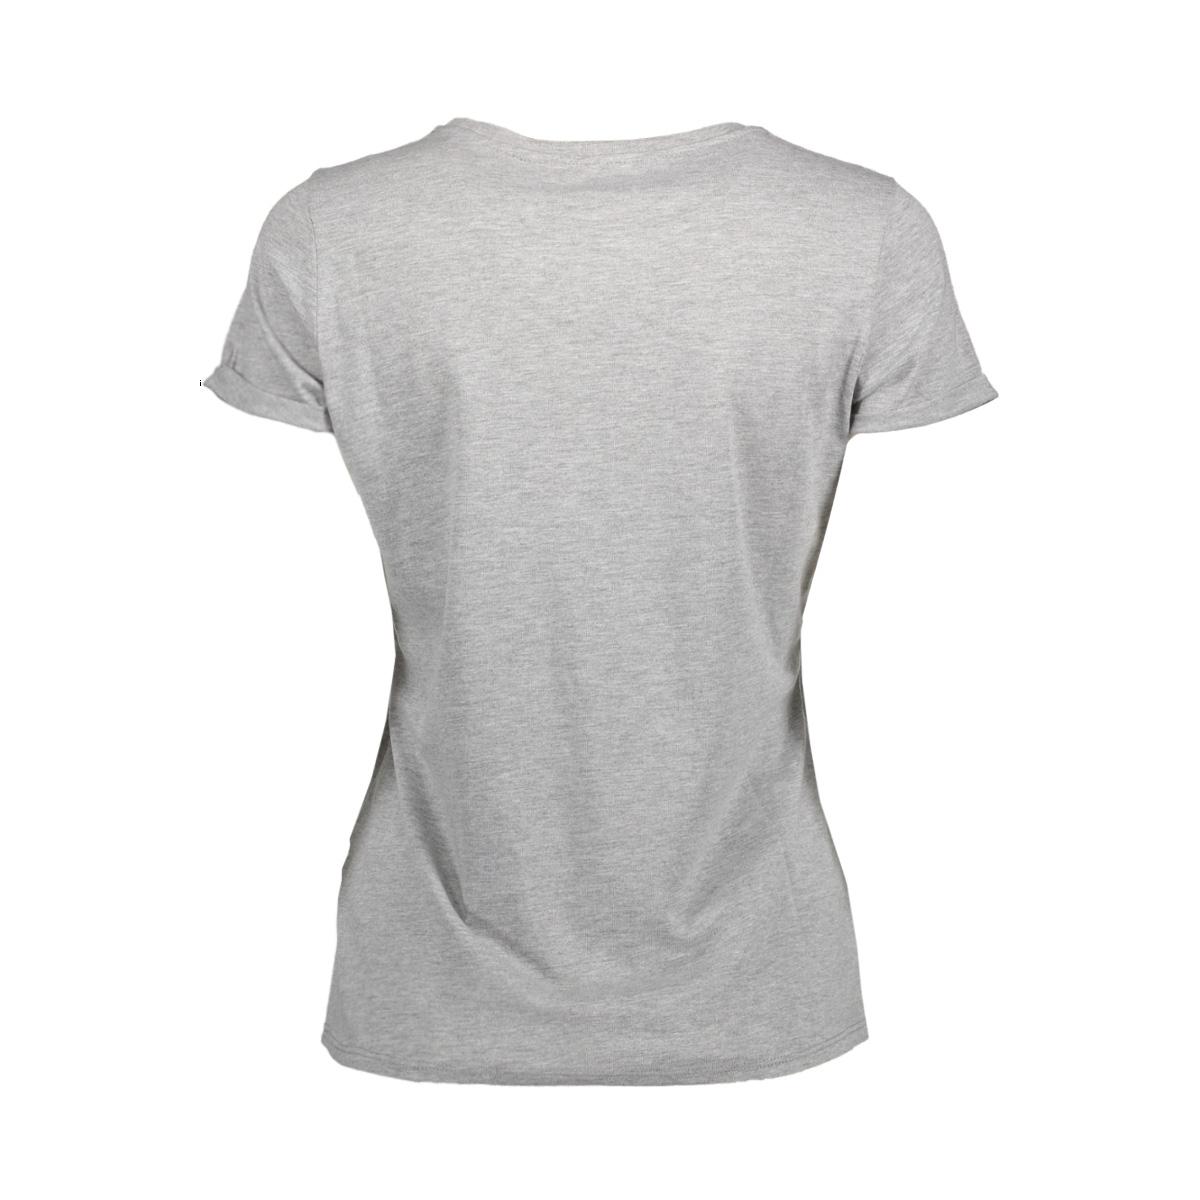 i70002 garcia t-shirt 66